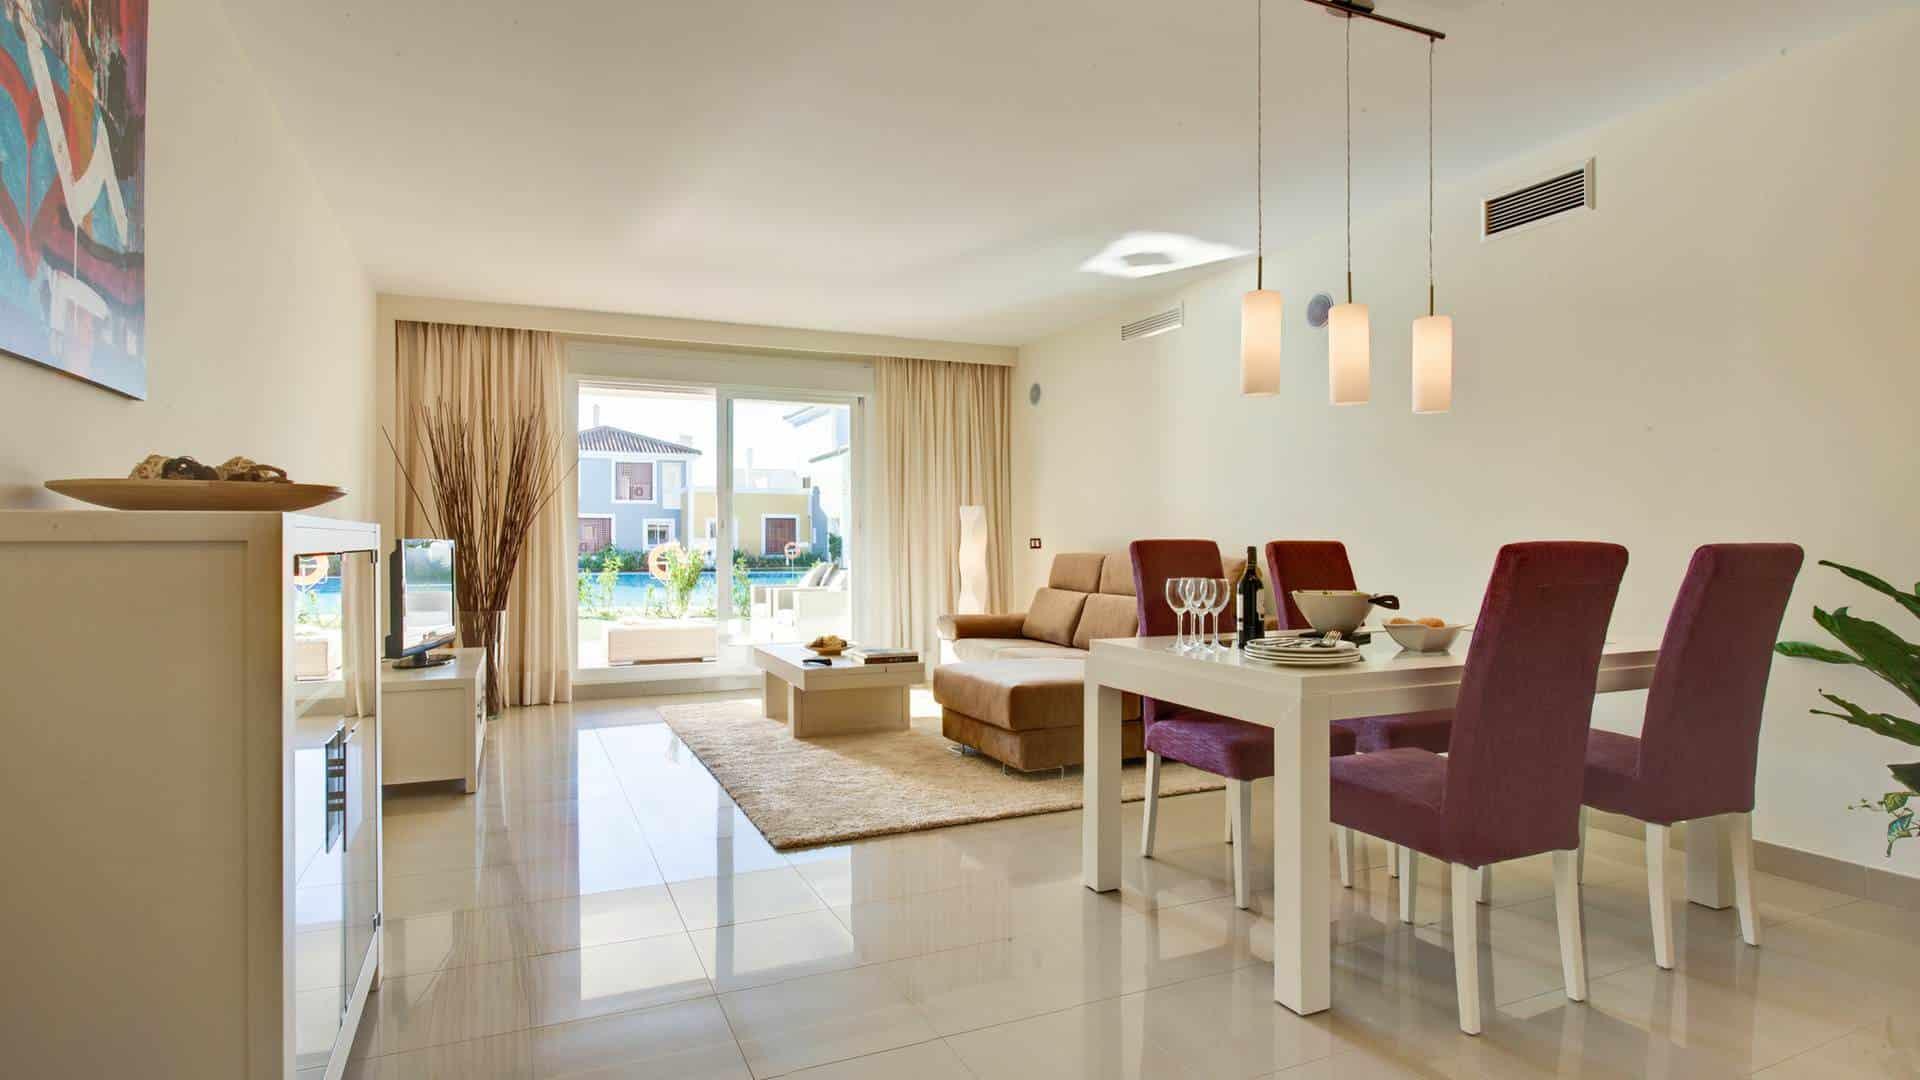 Ground floor apartment with large garden for sale in Cortijo del Mar Resort Estepona